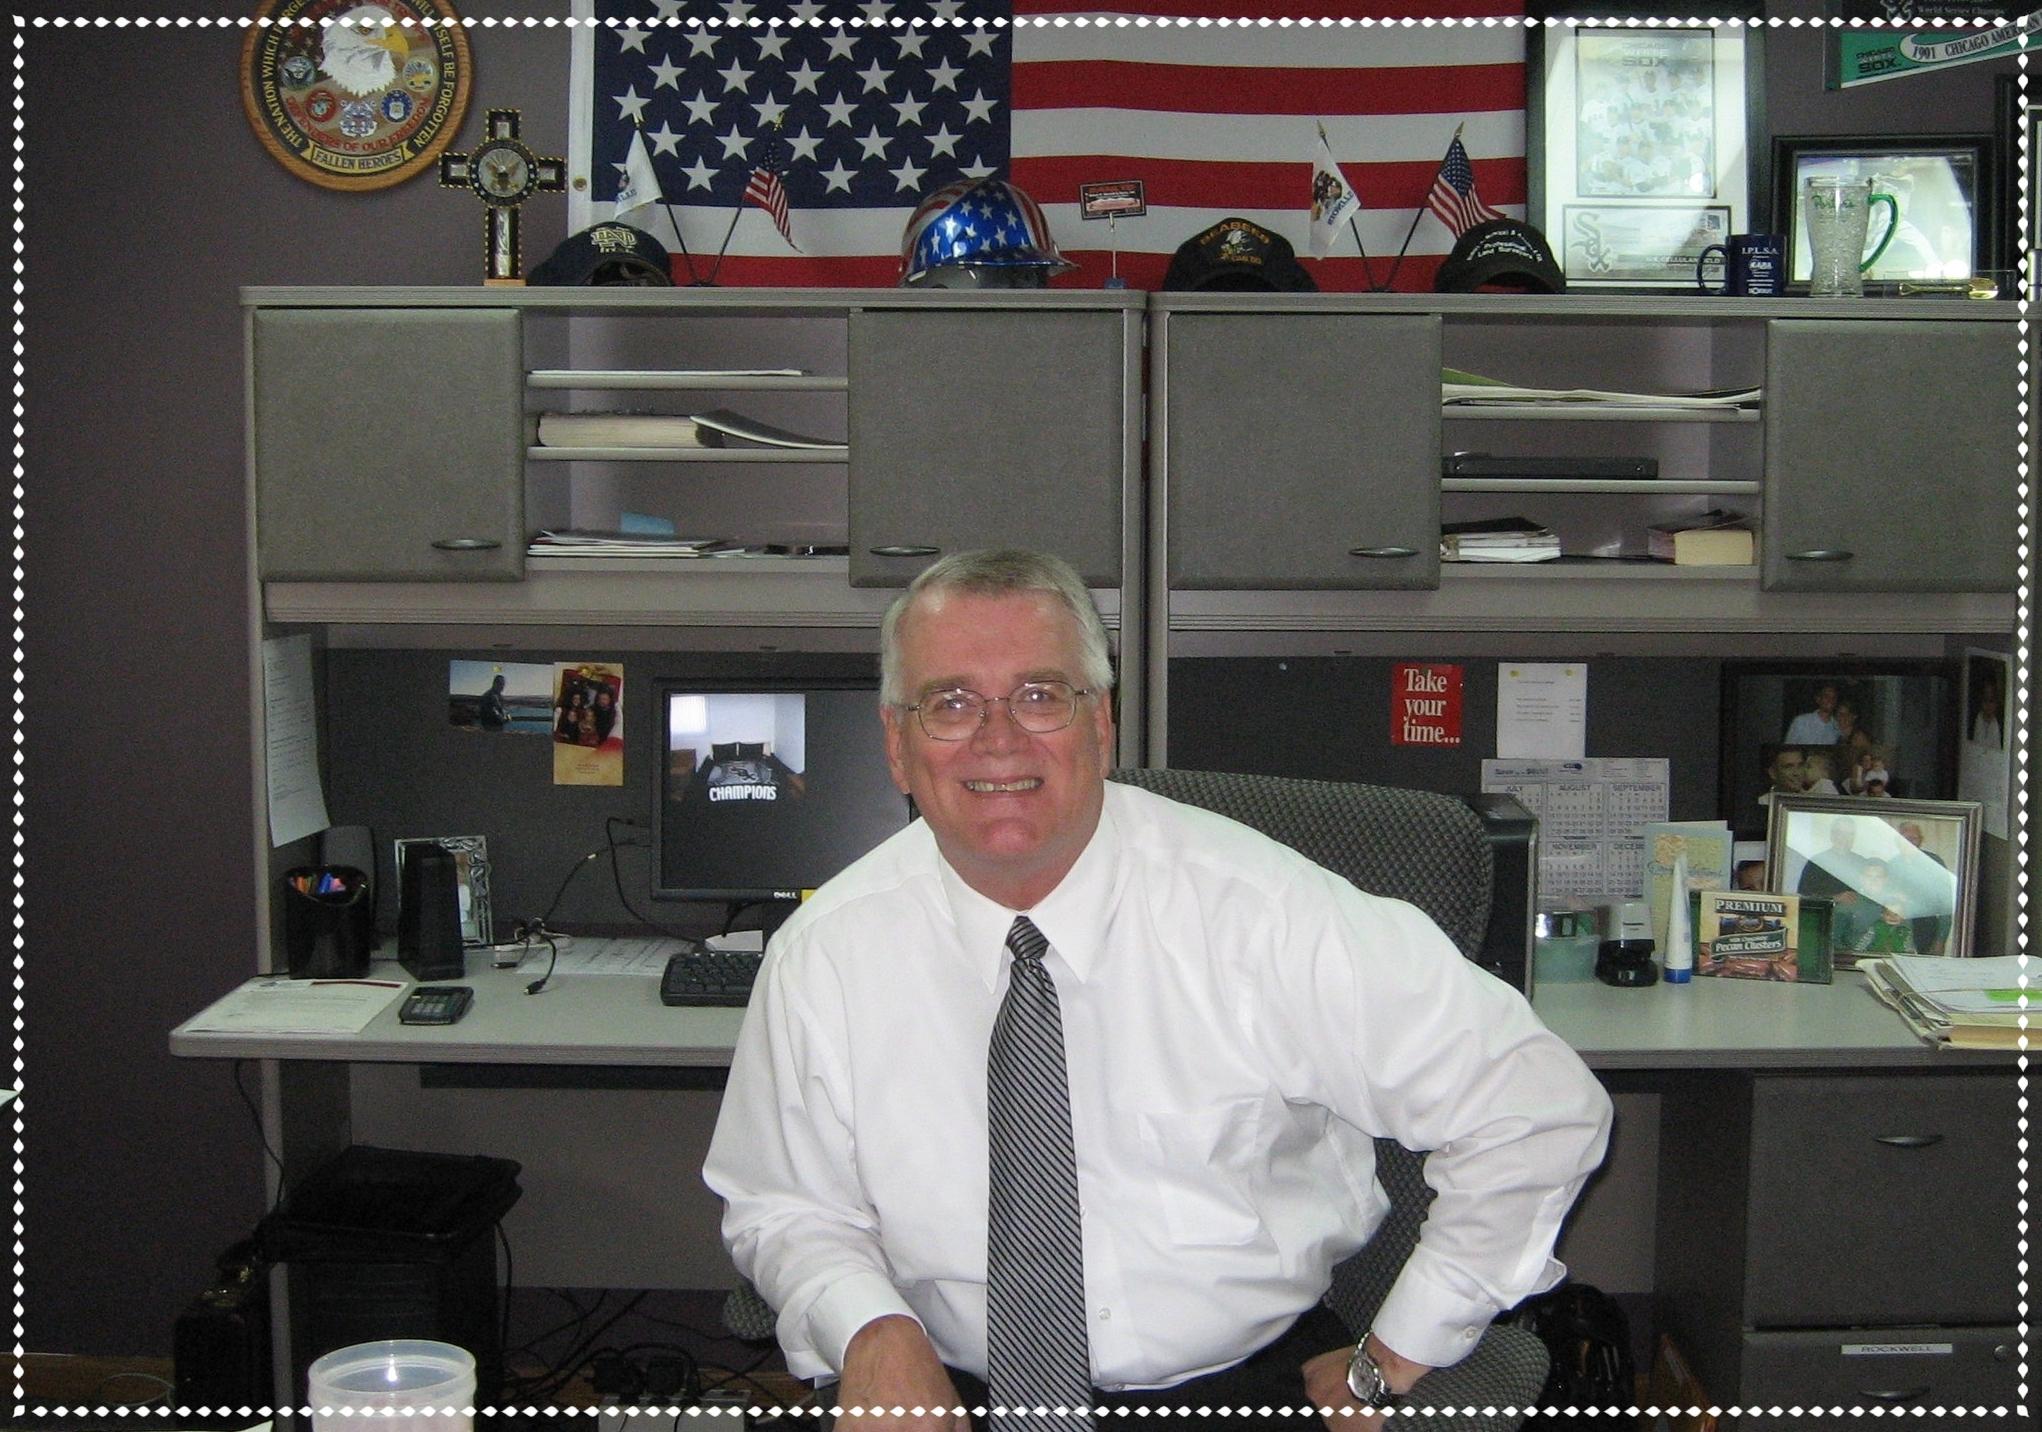 Paul Nowicki, CEO